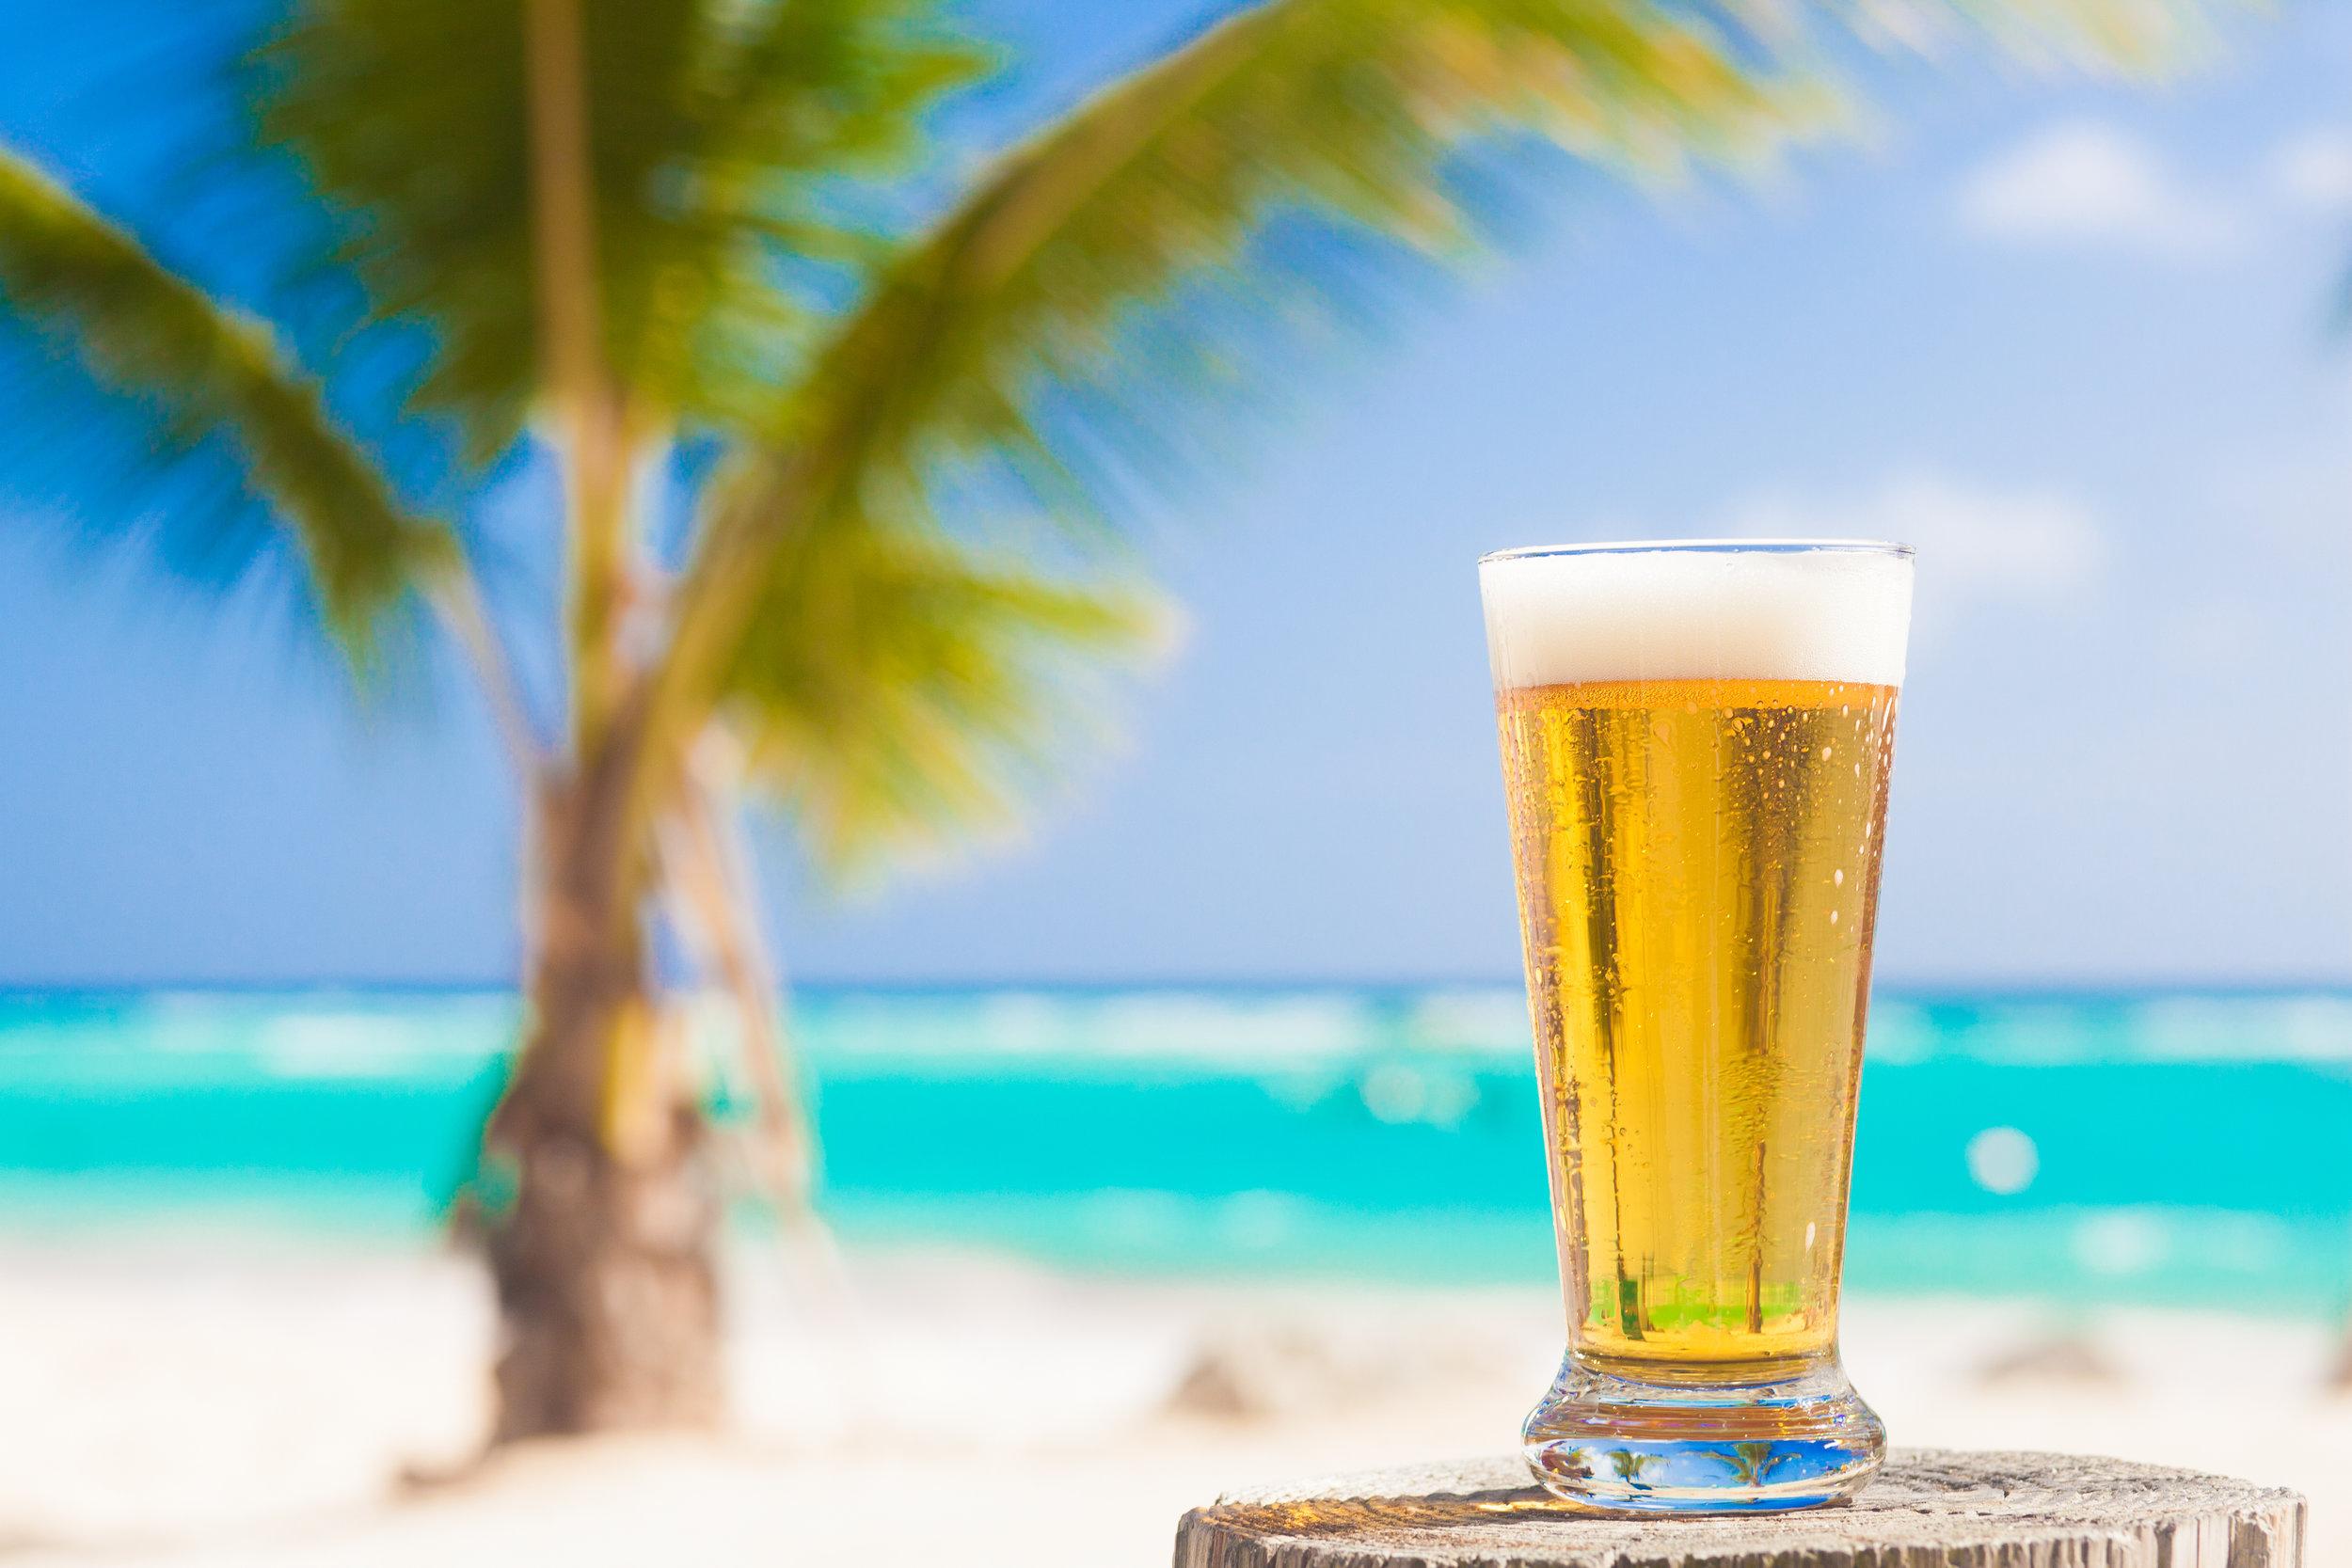 shutterstock_374397763.jpg - glass of cool beer on table near beach.jpg